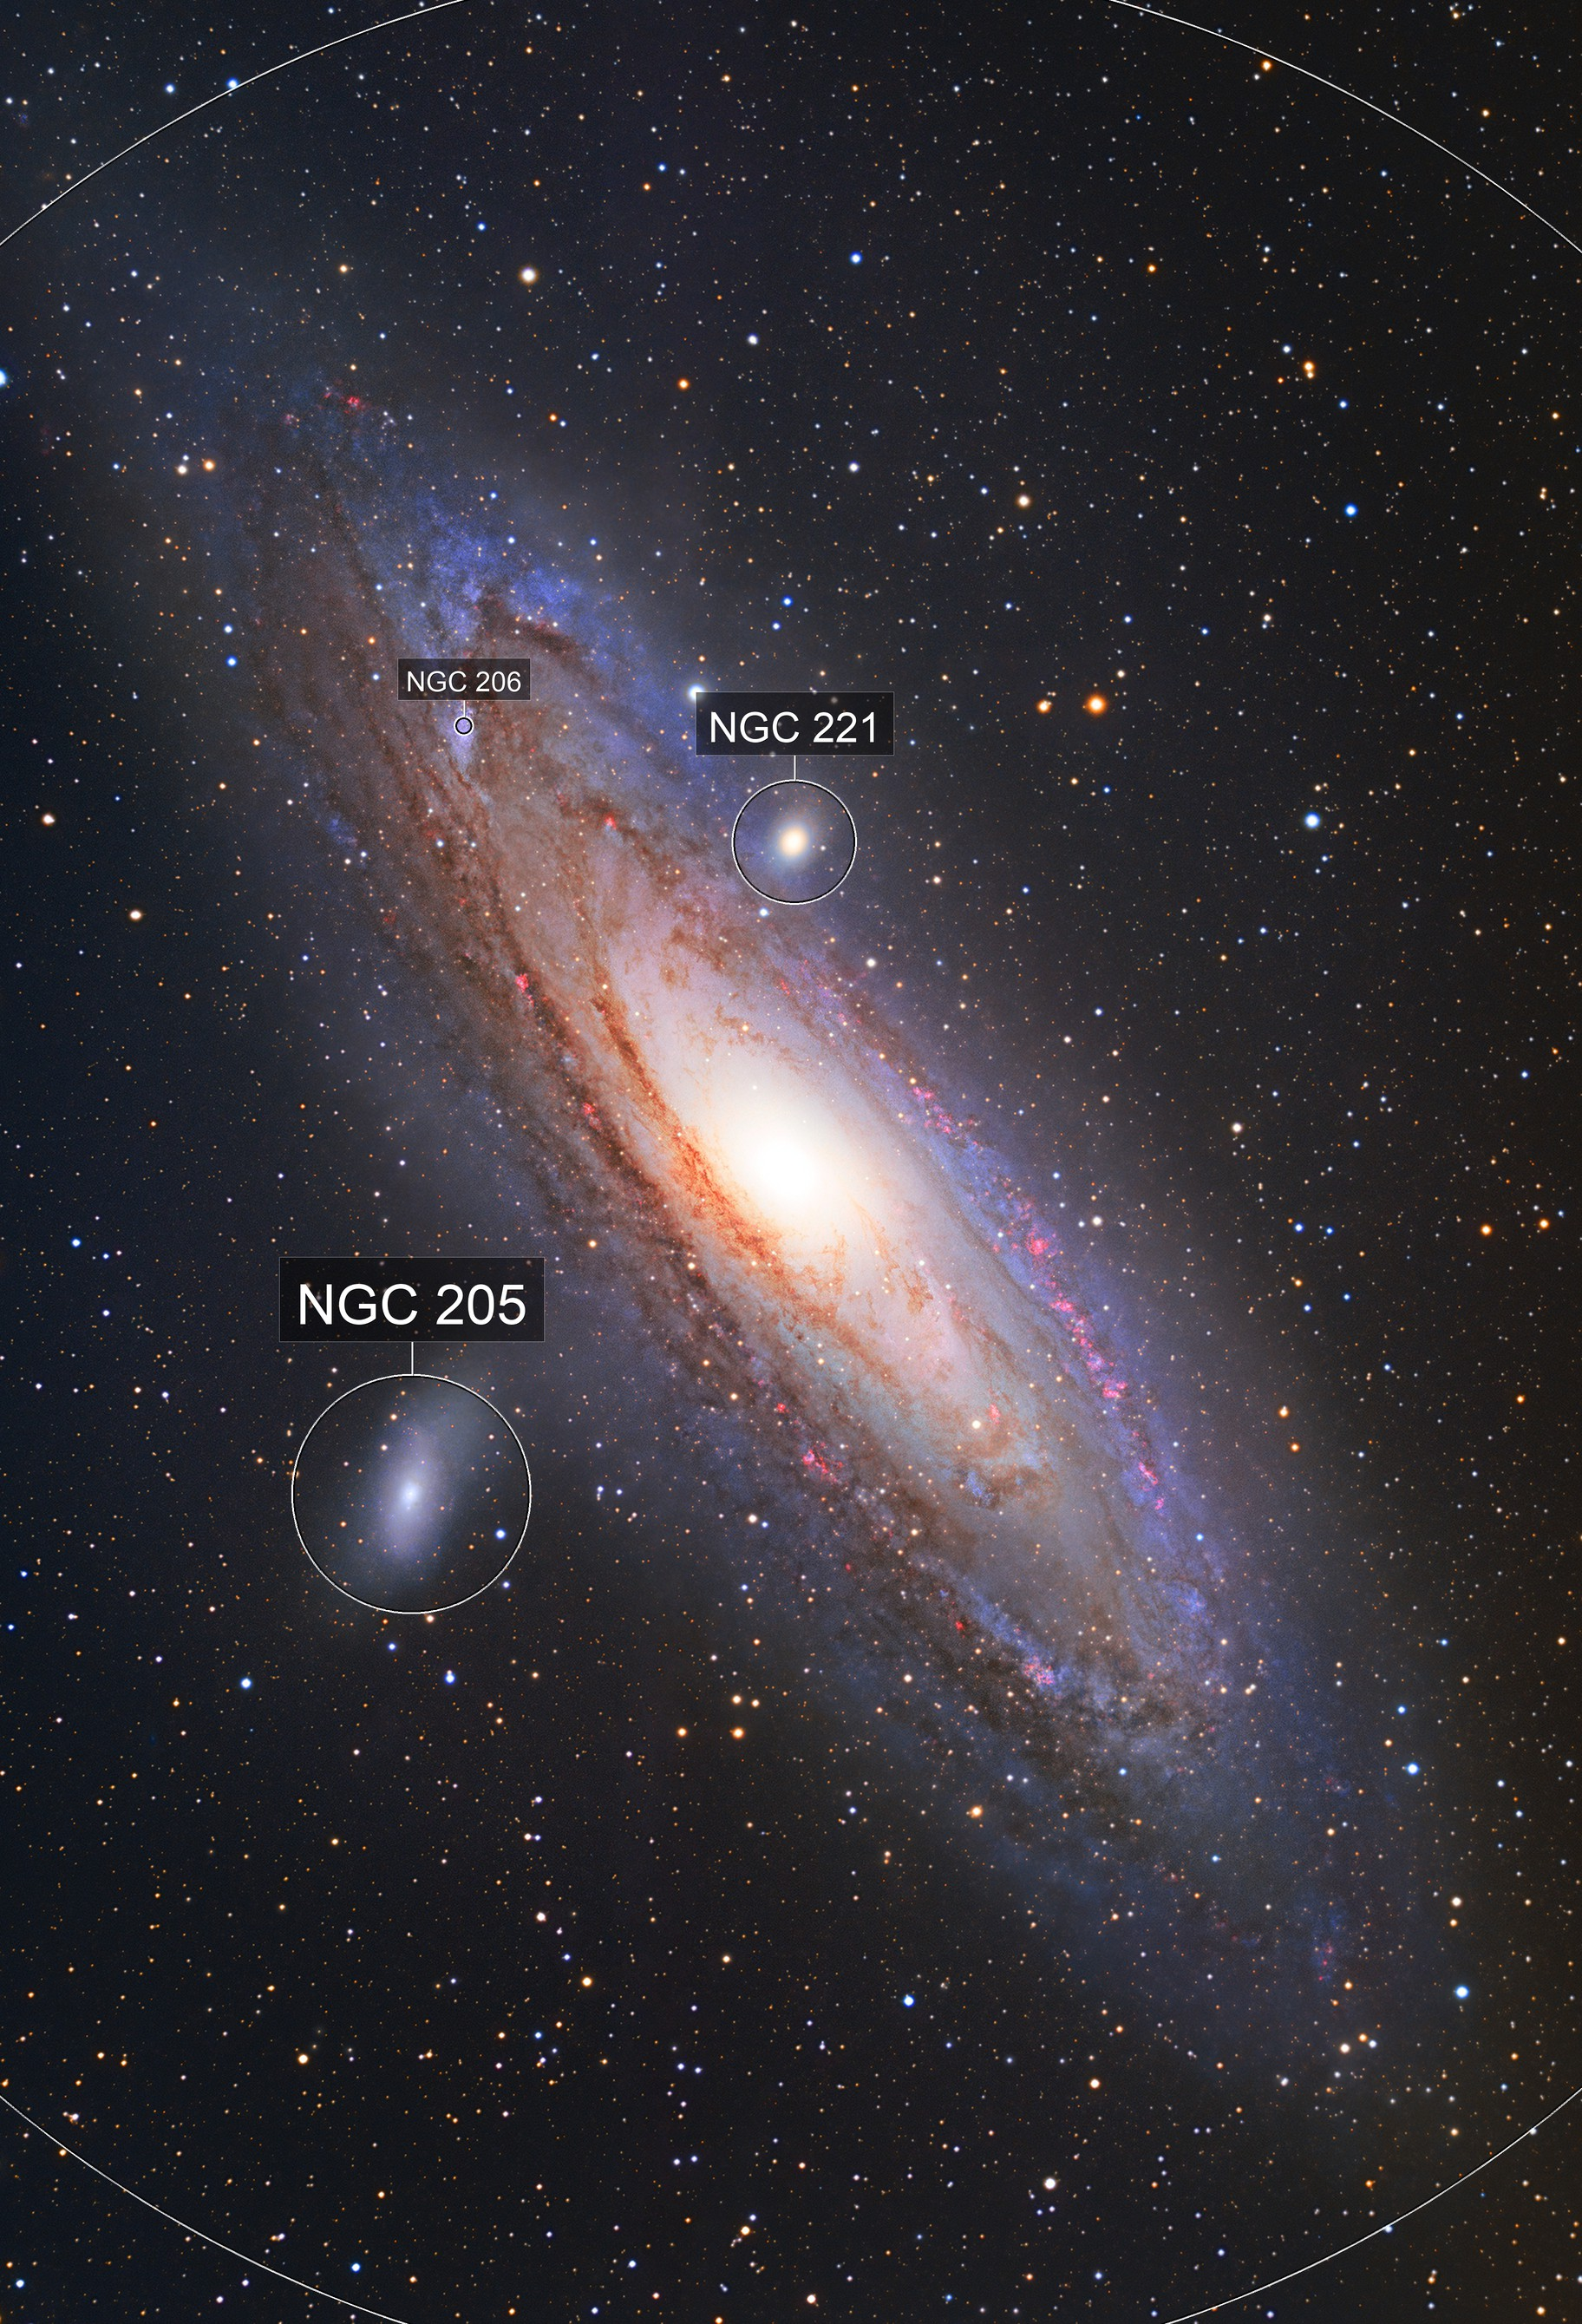 M31 - The Andromeda Galaxy in HaLRGB